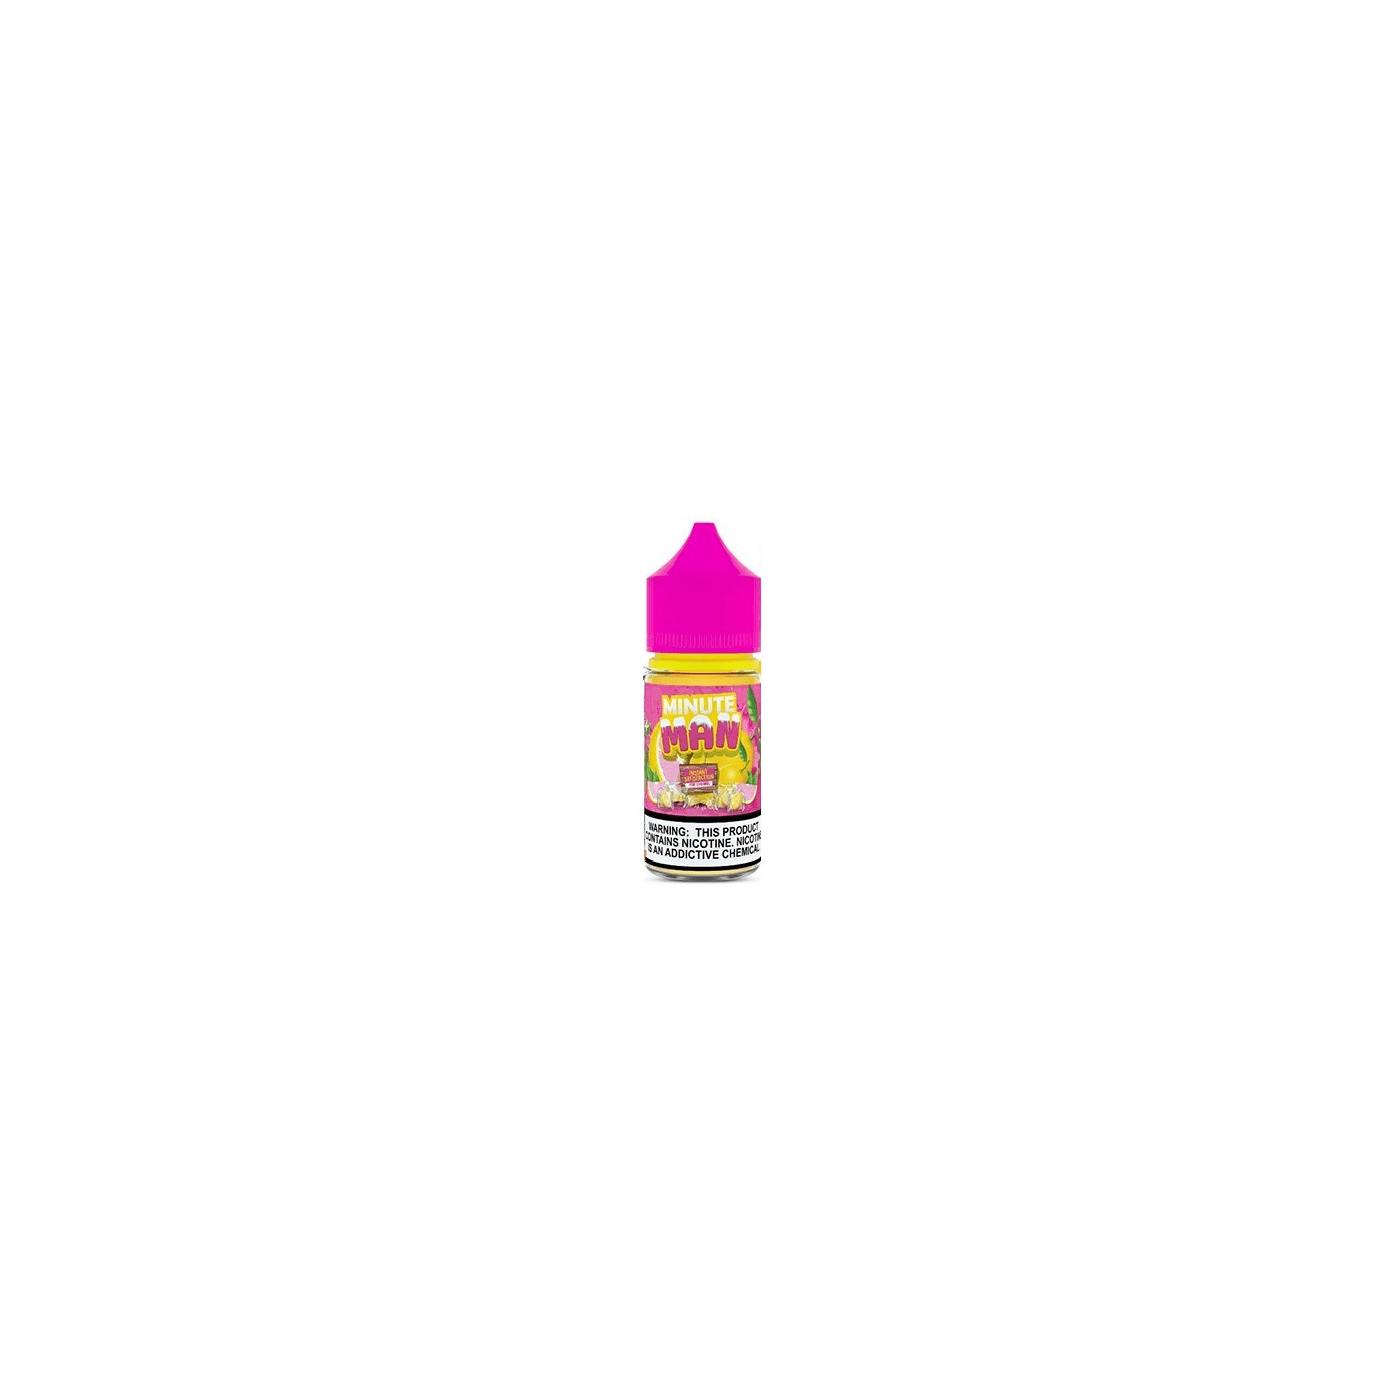 Minute Man Pink Lemonade